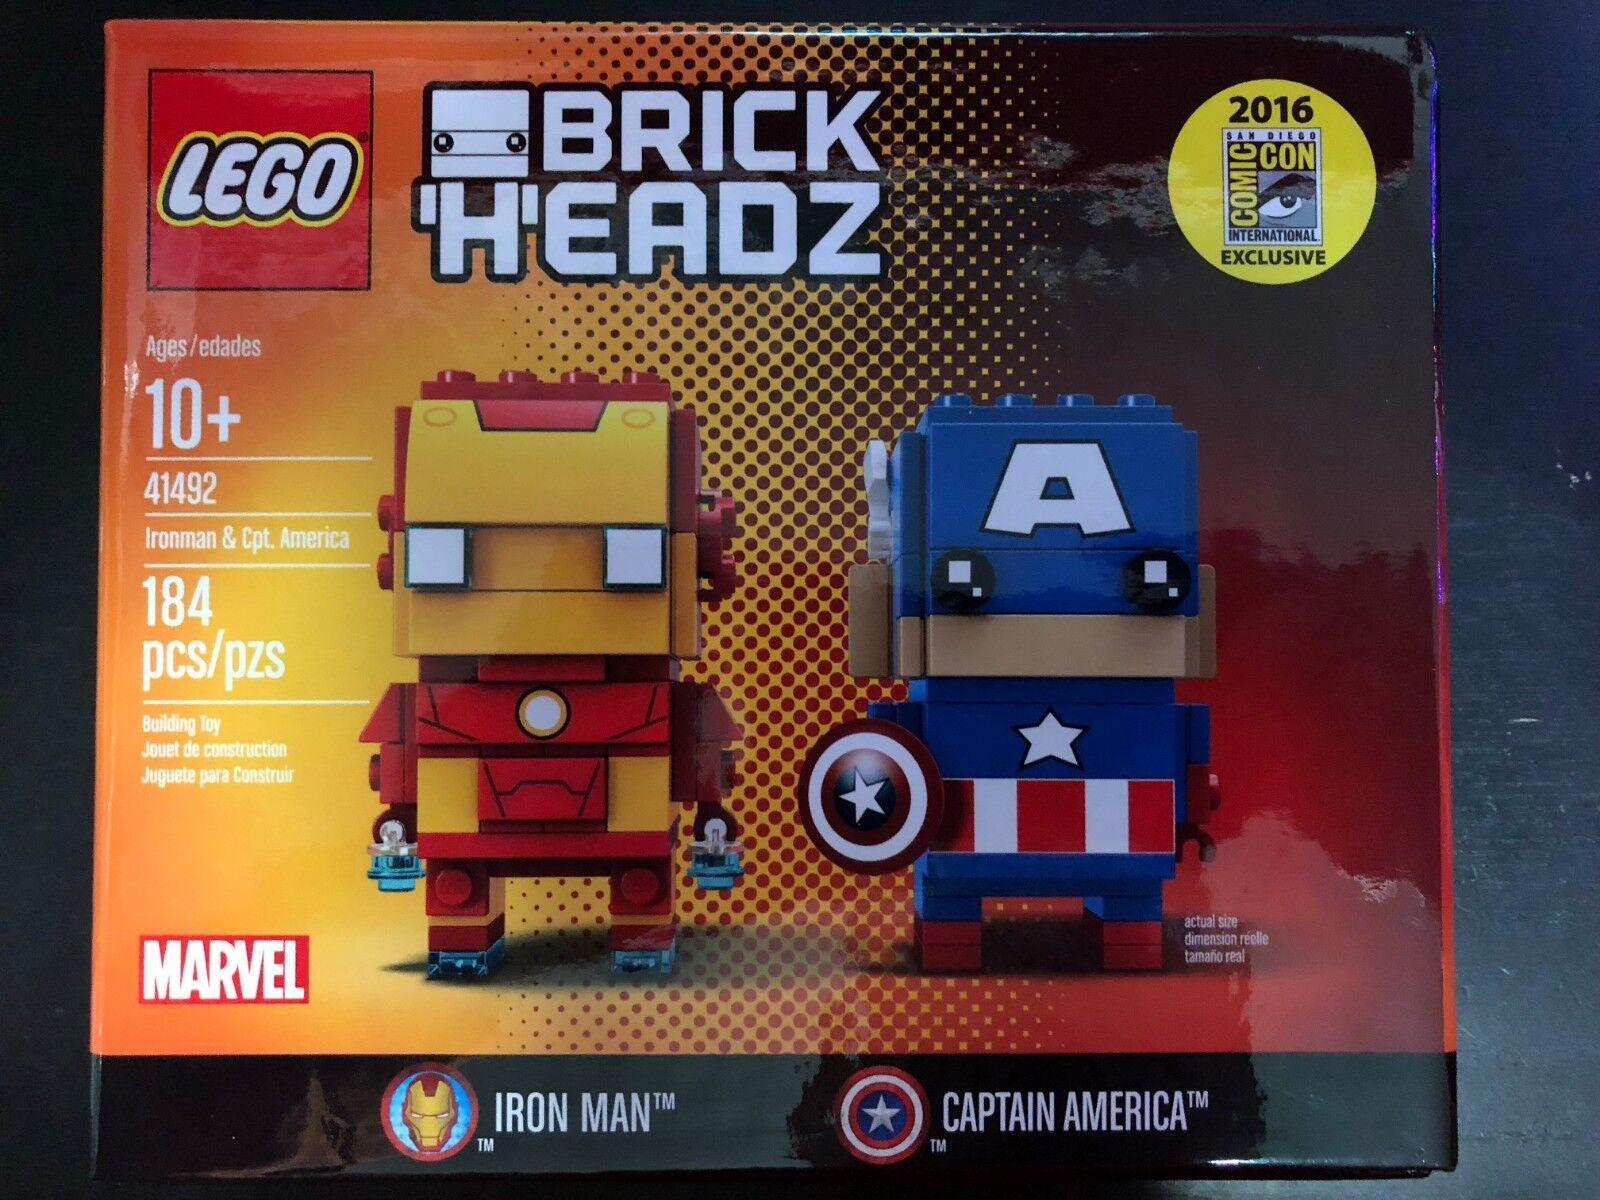 LEGO SDCC 2016 Brick Headz Captain America & Iron Man Exclusive New 41492